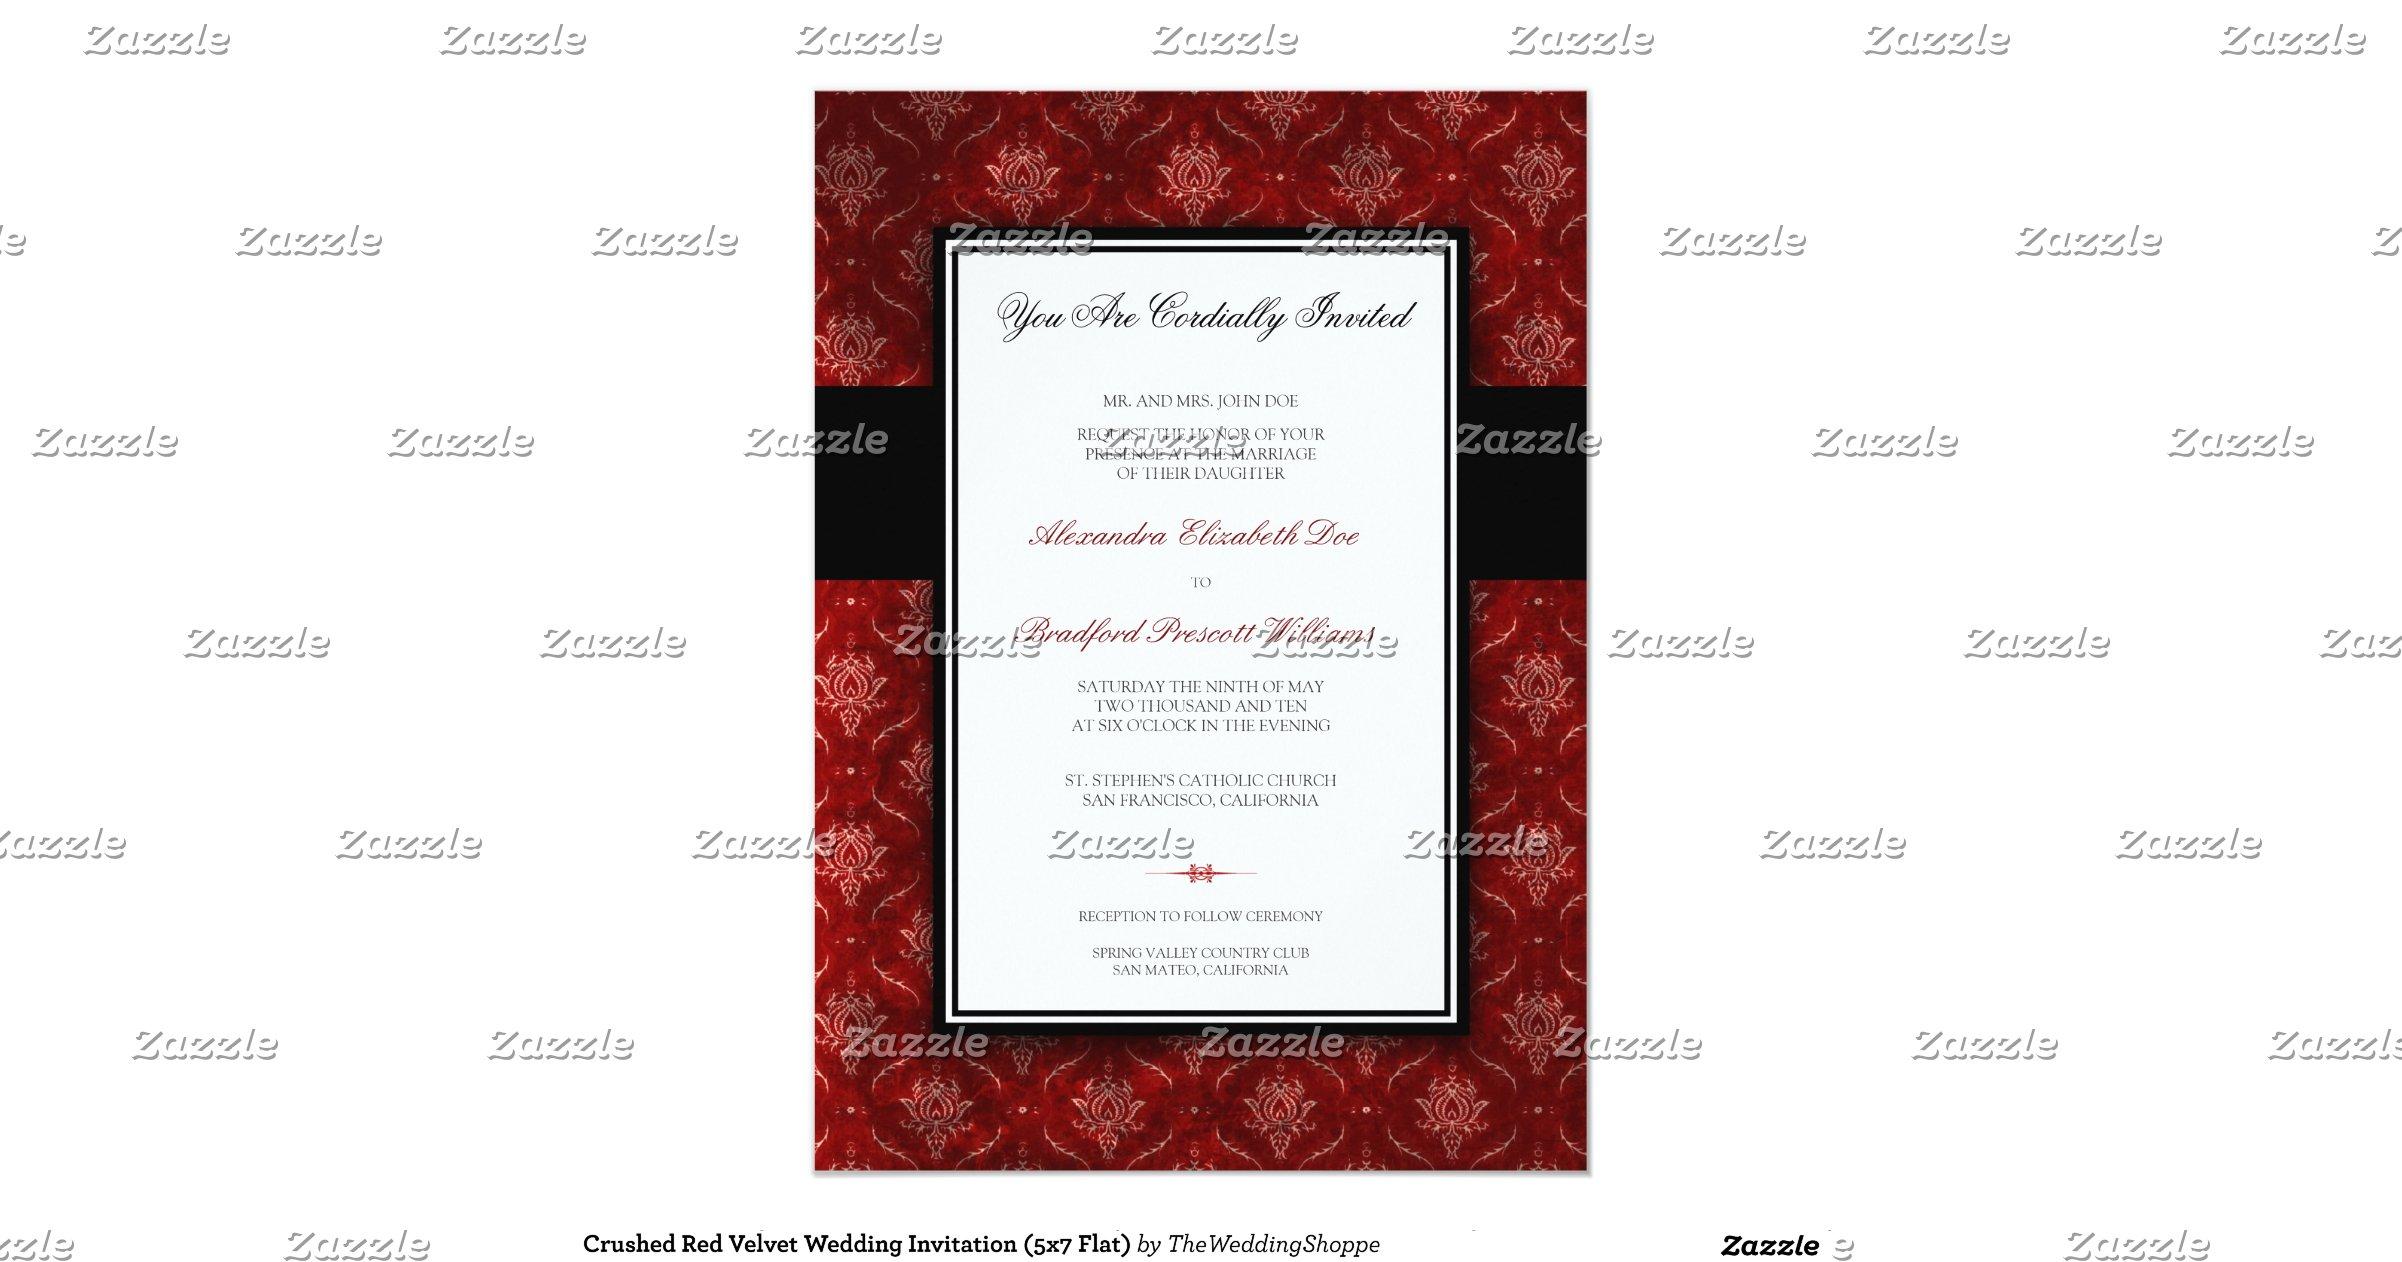 Velvet Wedding Invitations: Crushed_red_velvet_wedding_invitation_5x7_flat